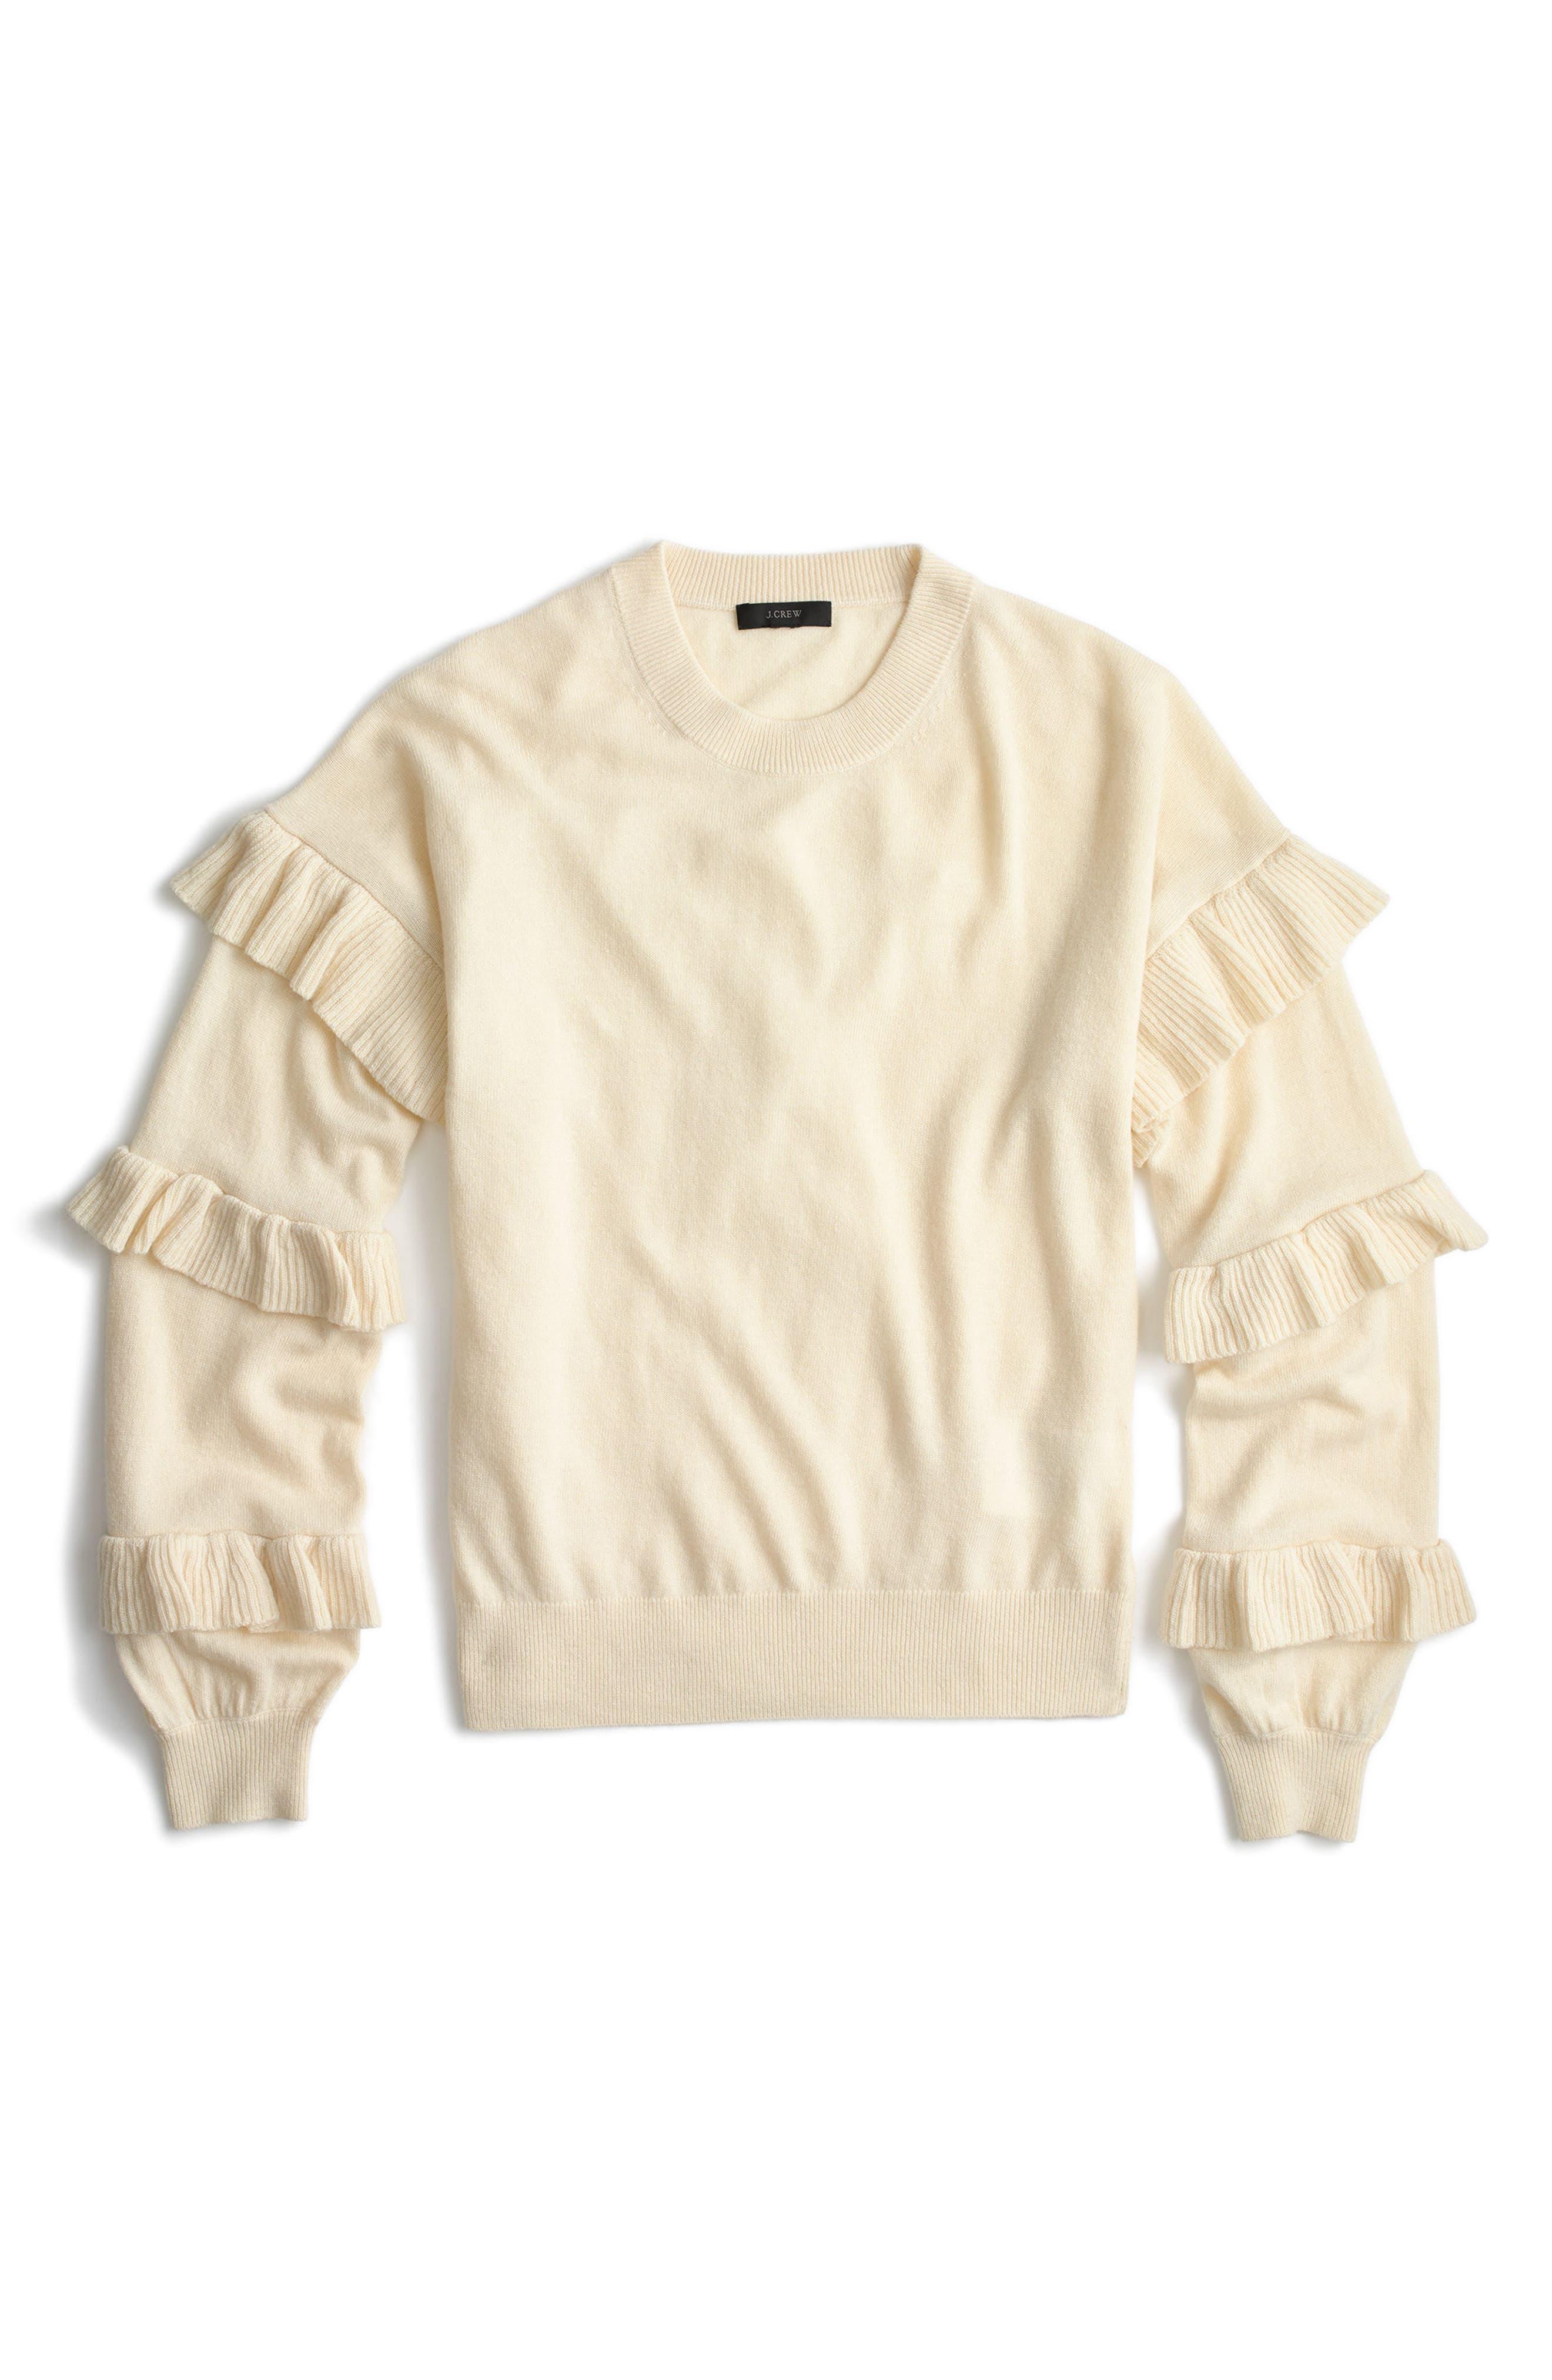 Ruffle Sleeve Sweater,                         Main,                         color, Heather Muslin